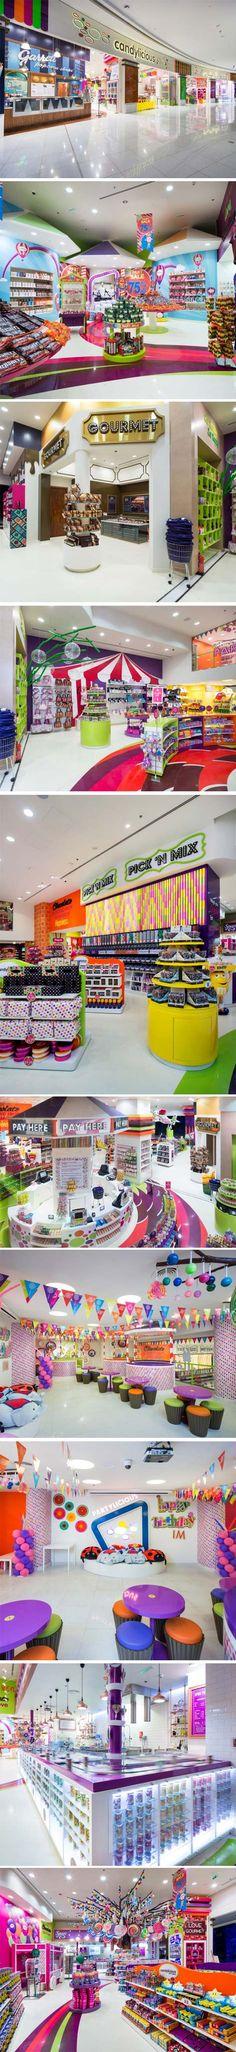 Candylicious at The Dubai Mall by Studio EM, Dubai – UAE.